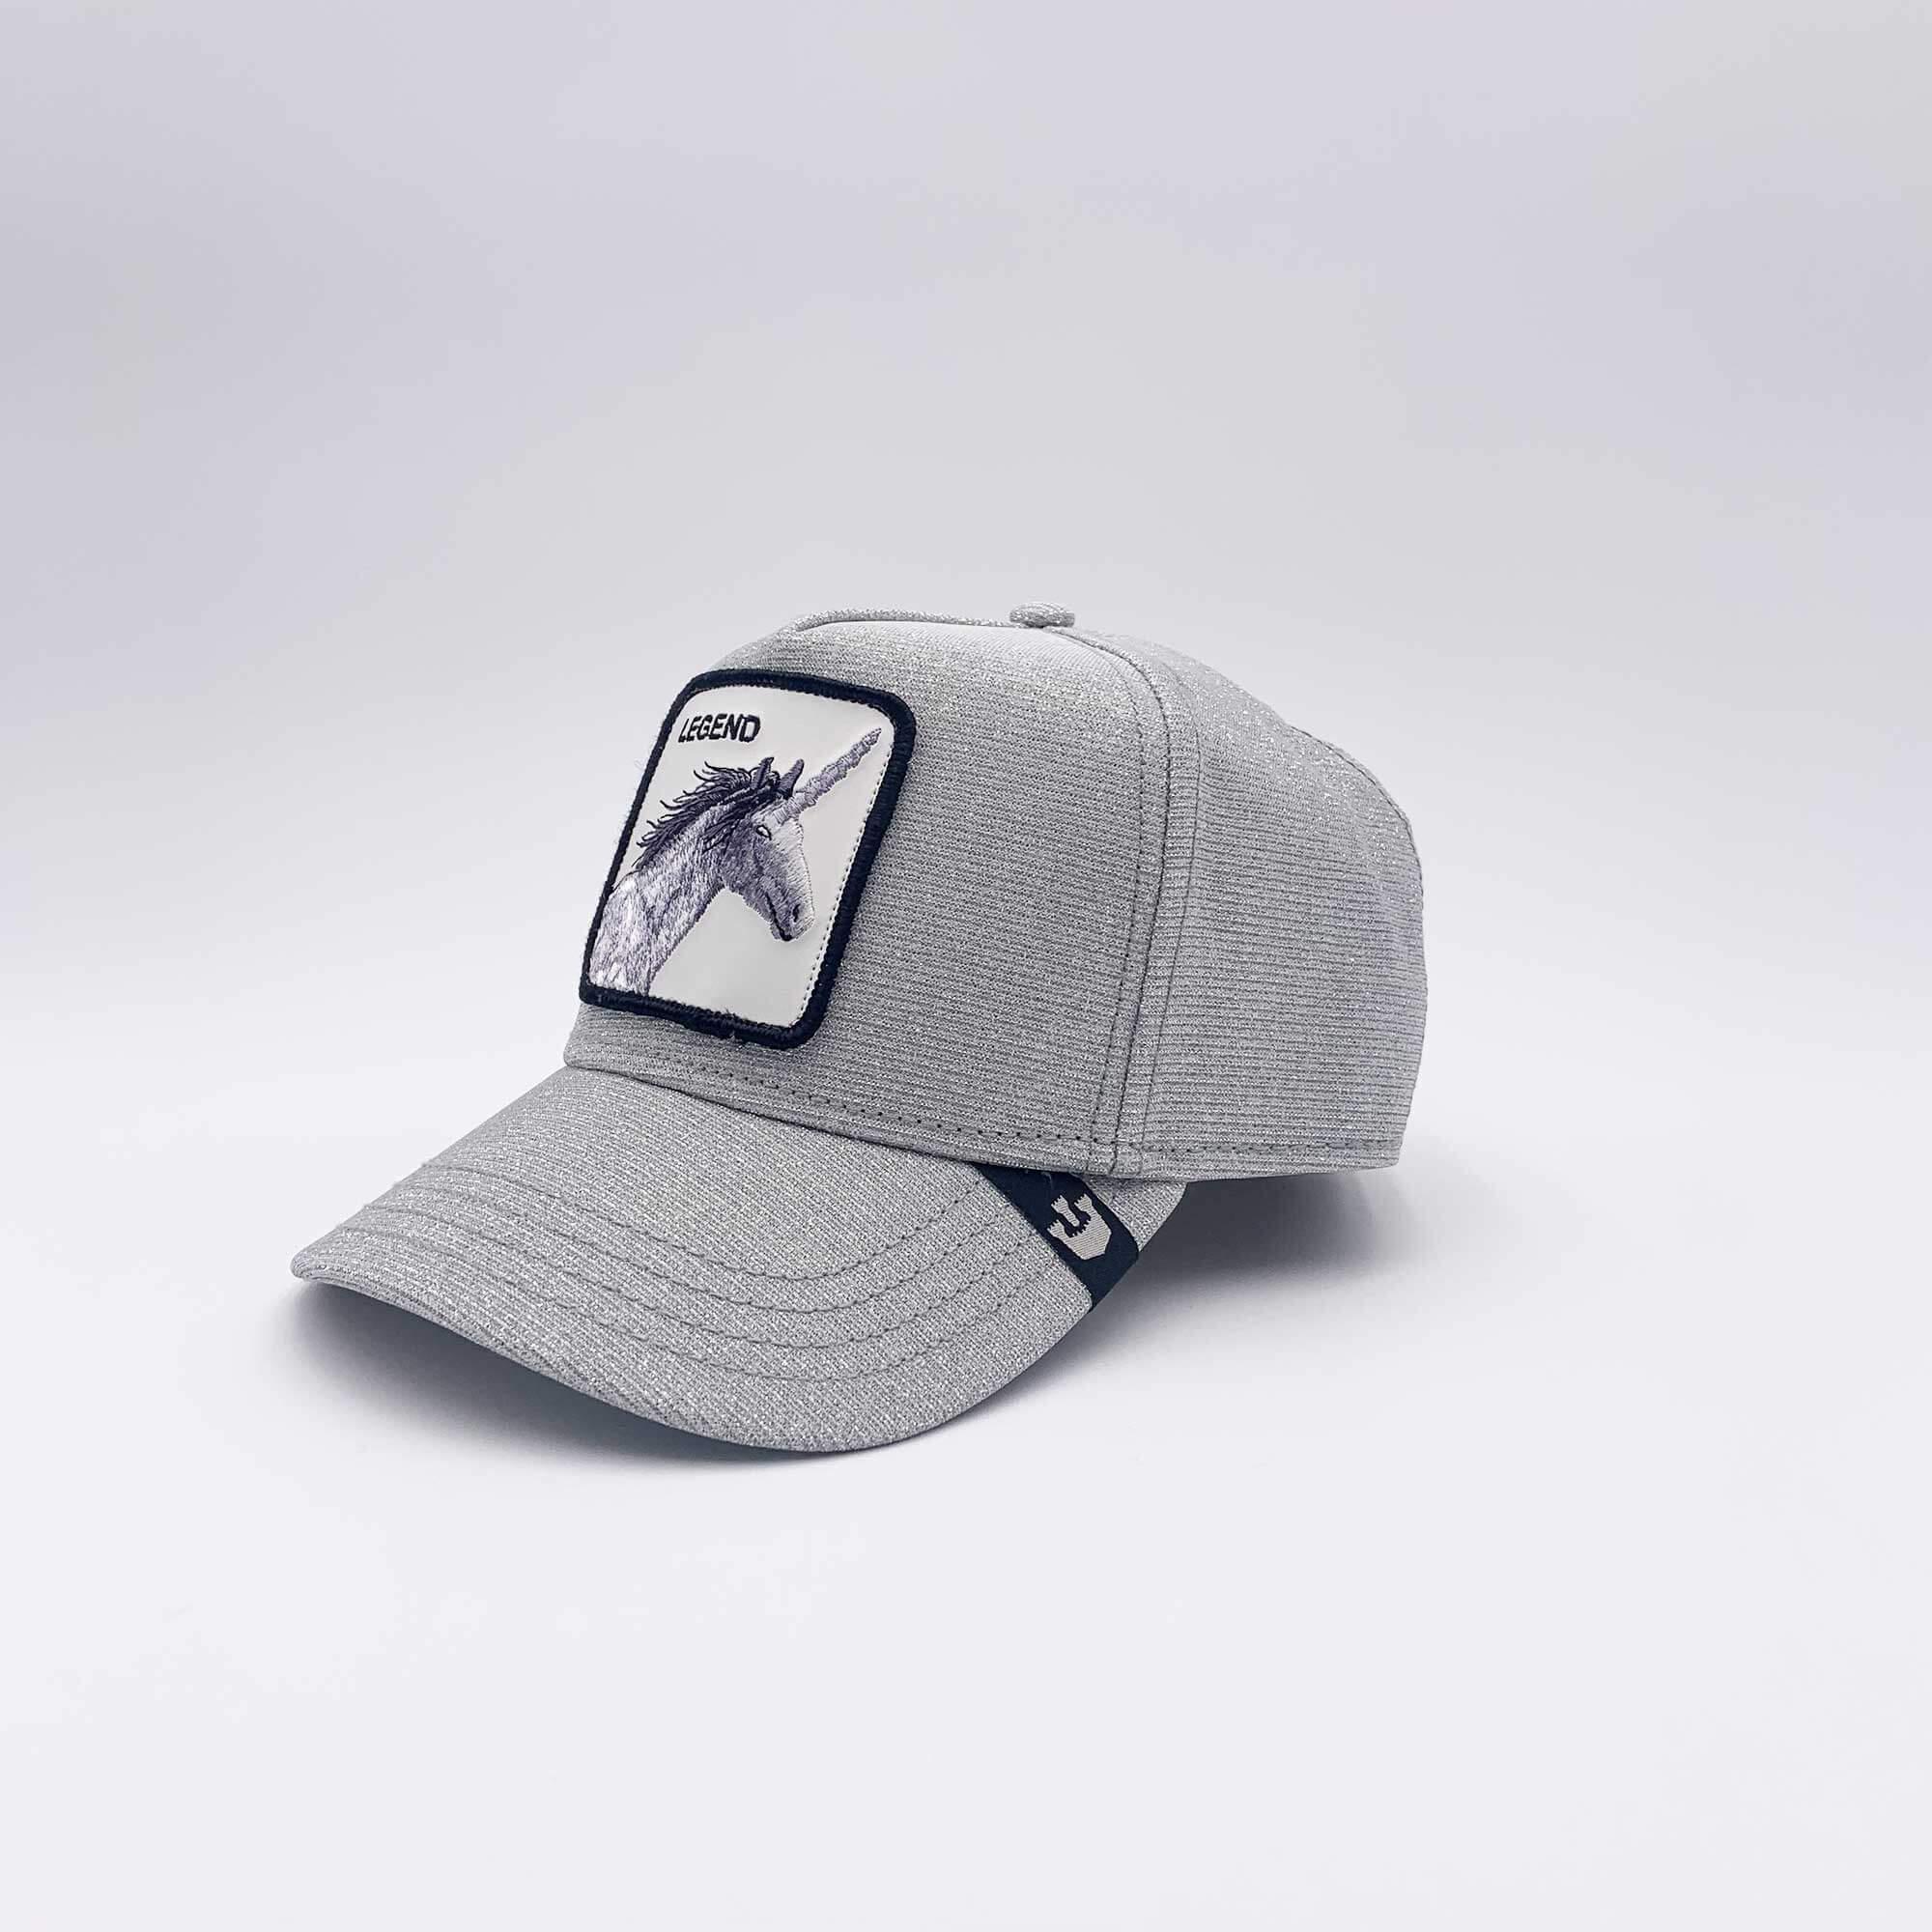 Cappello baseball legend - Silver lurex